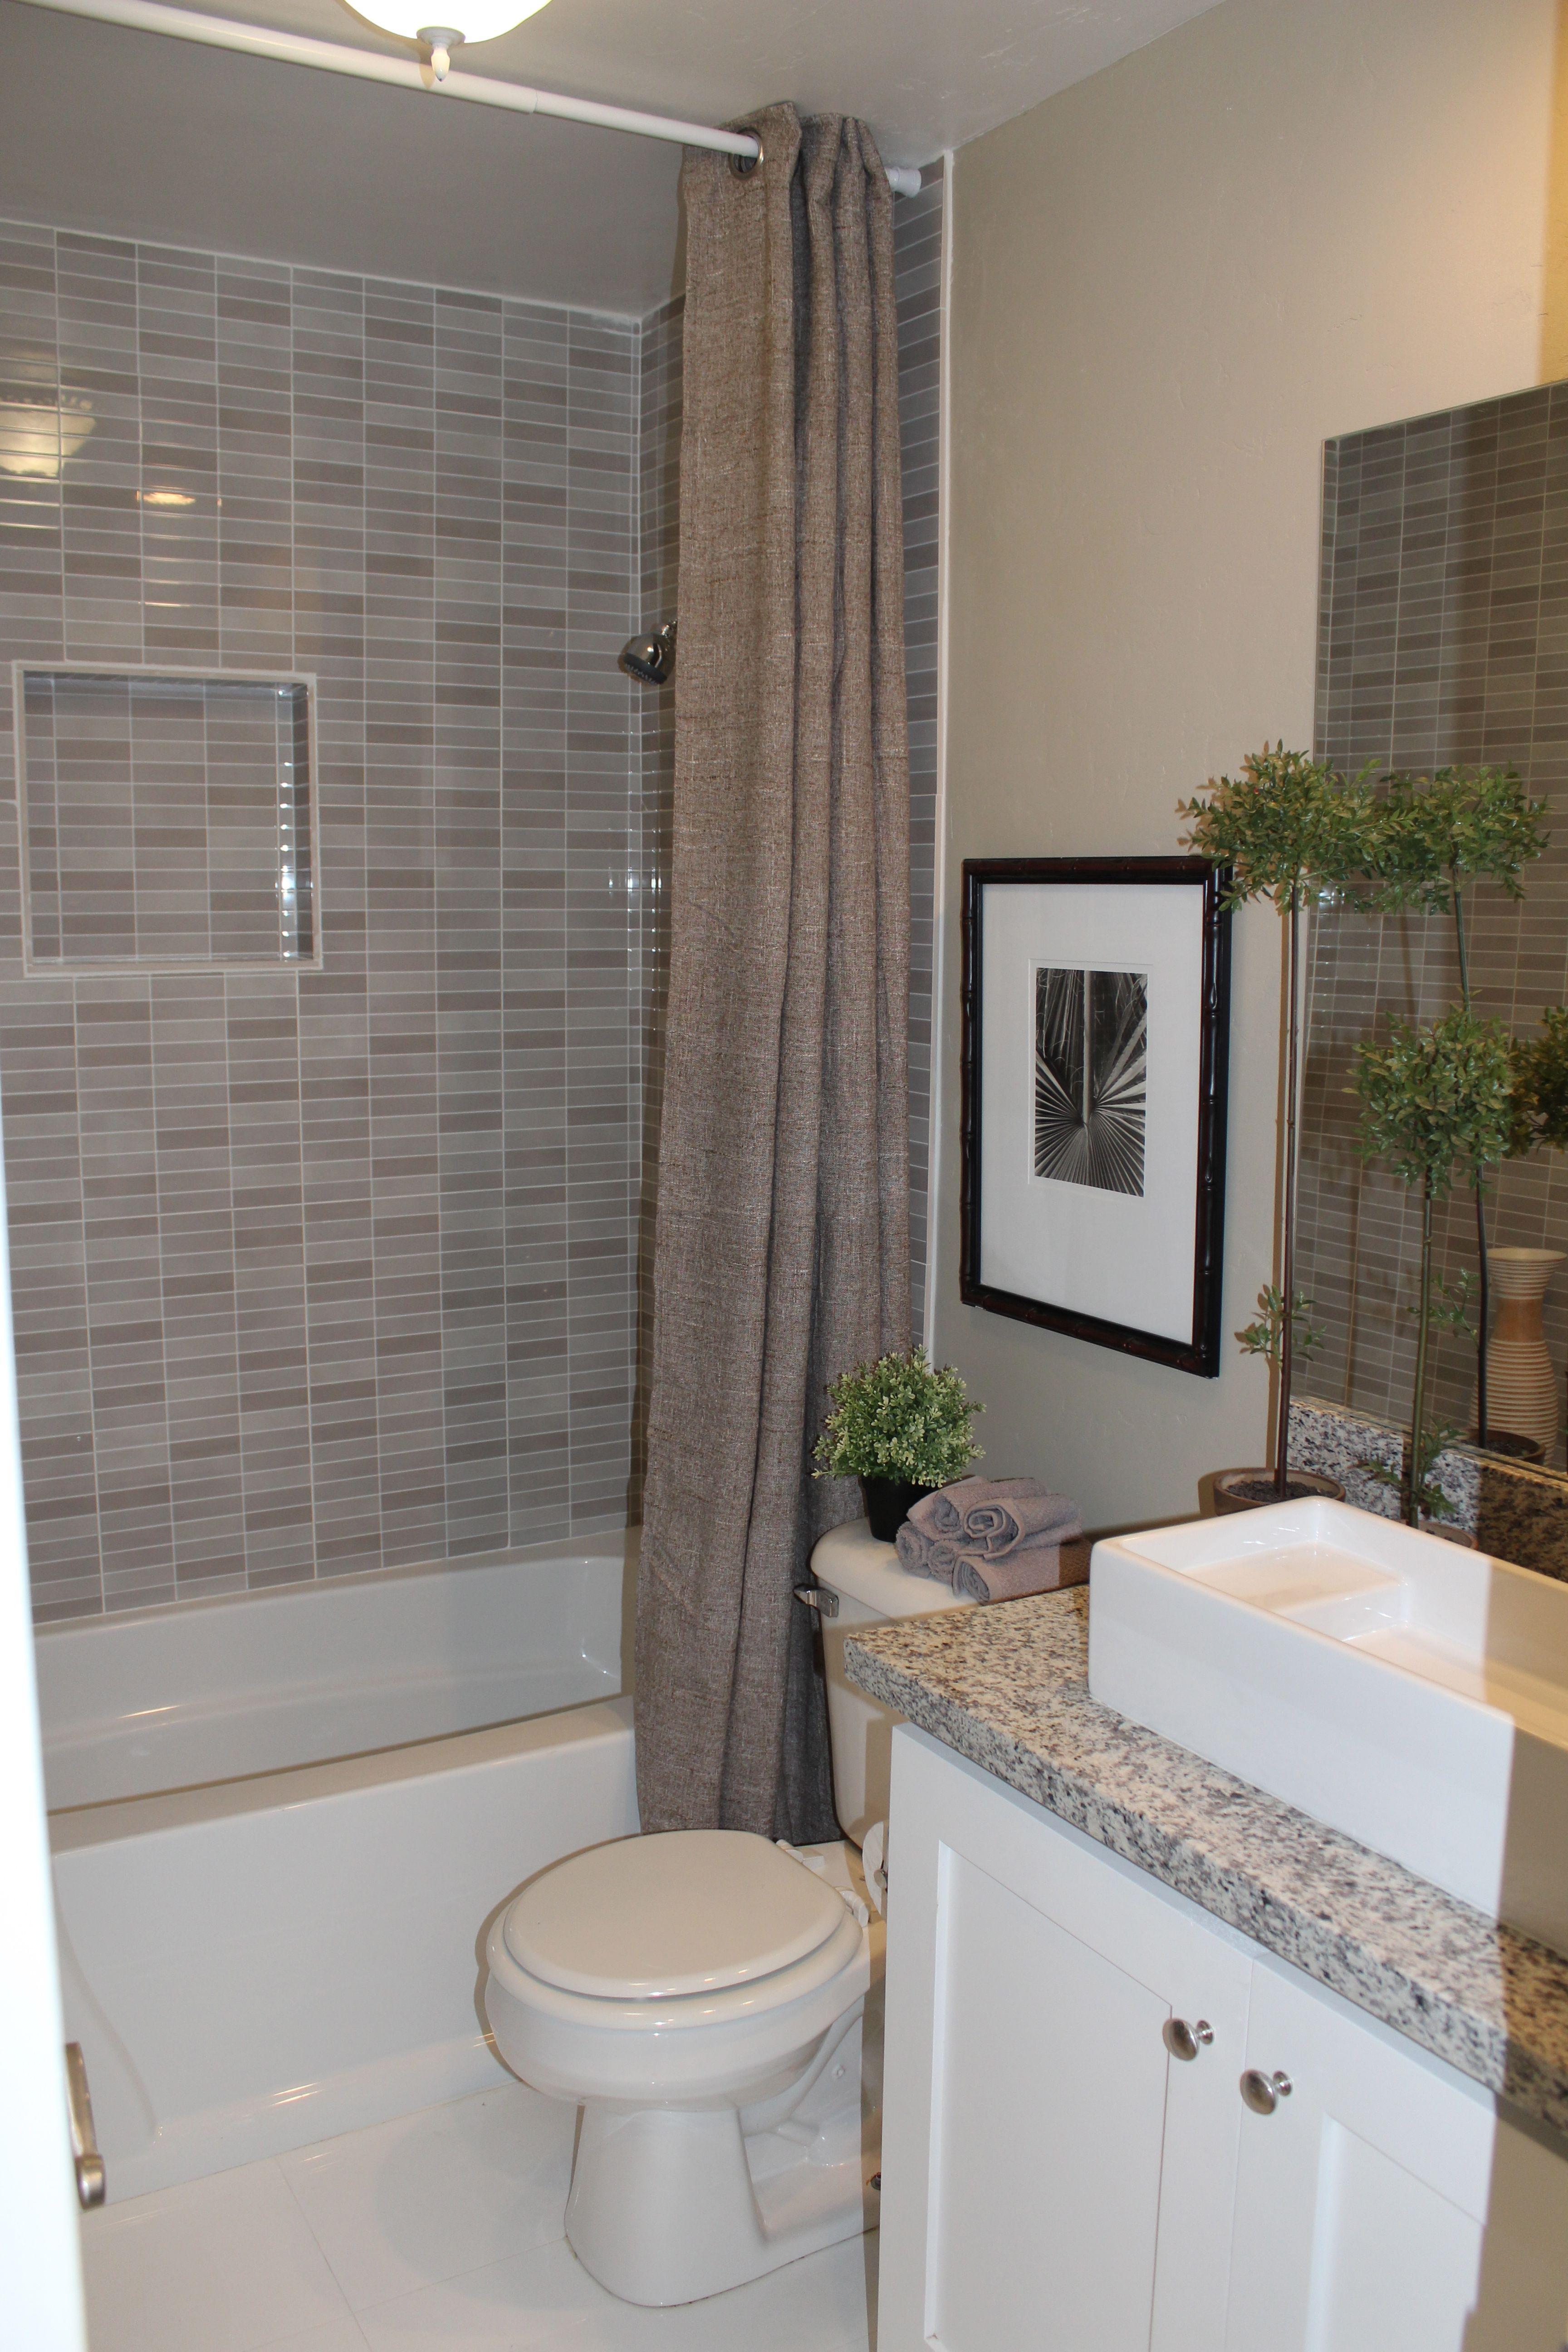 bathroom interior gray marble subway tile wall panelling - Subway Tile House Interior